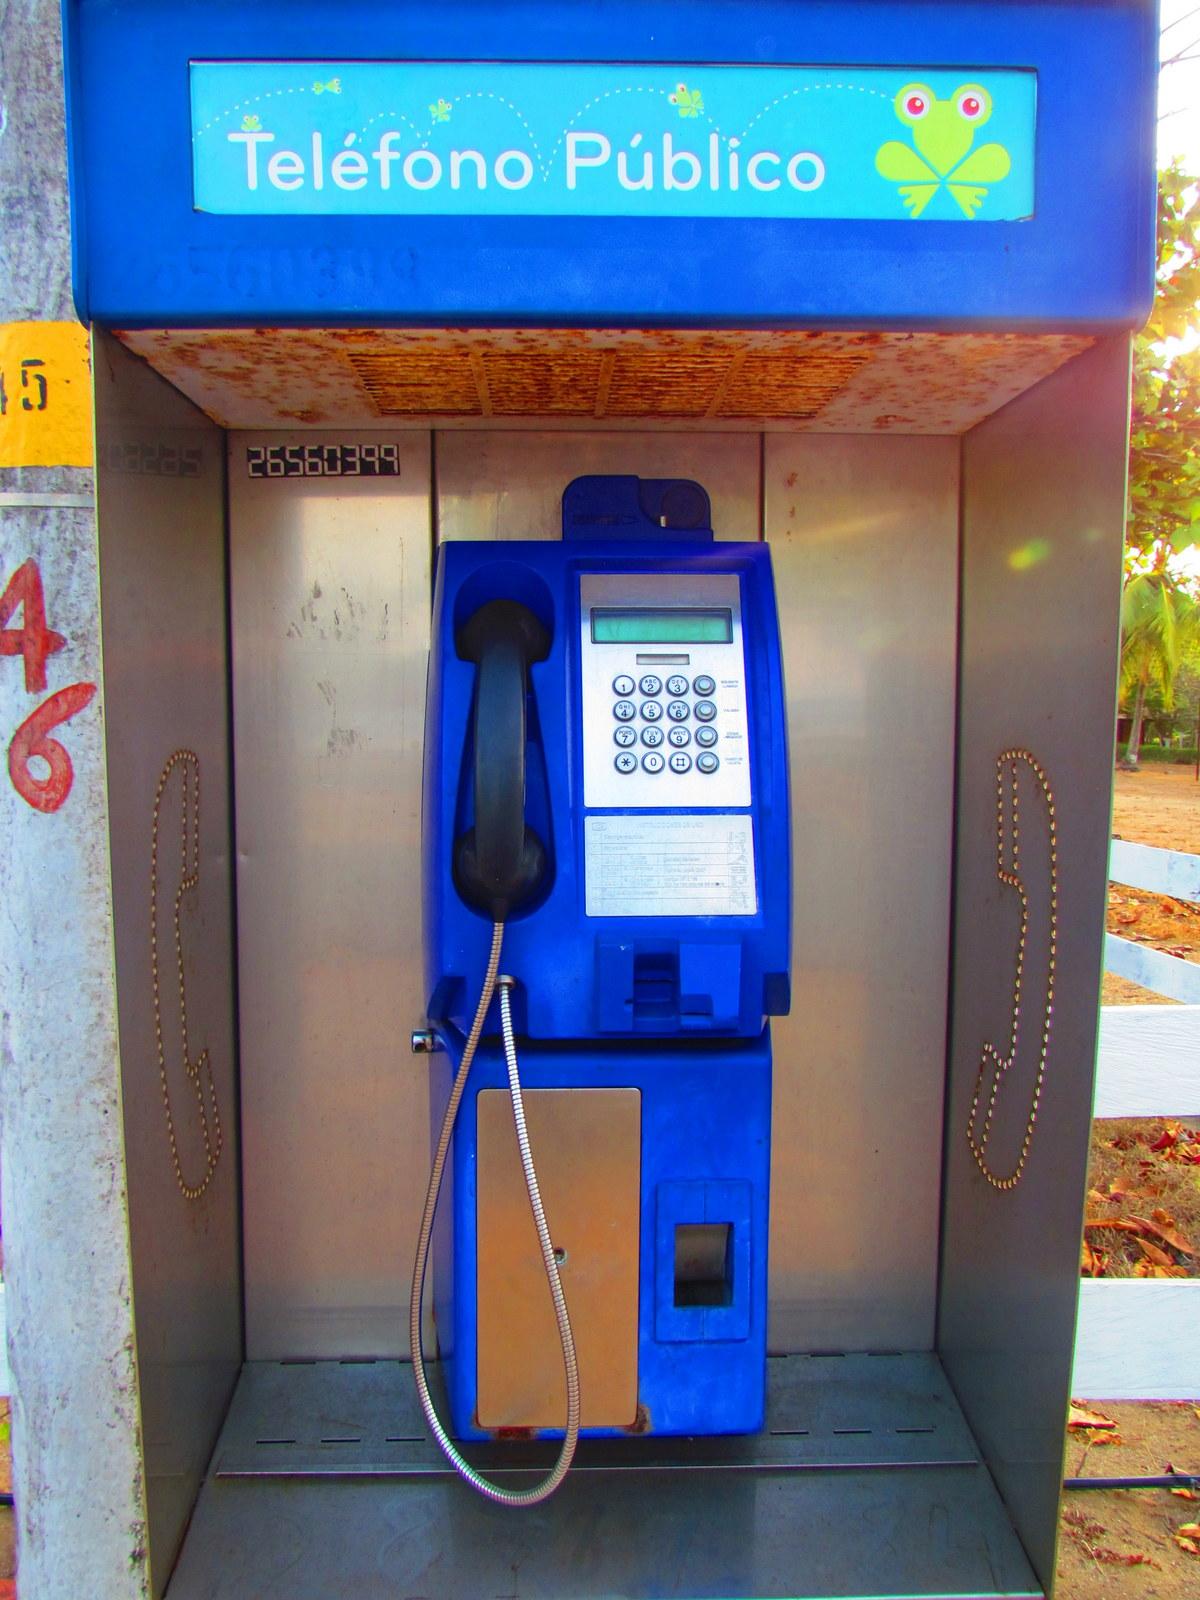 pay phone - télefono público